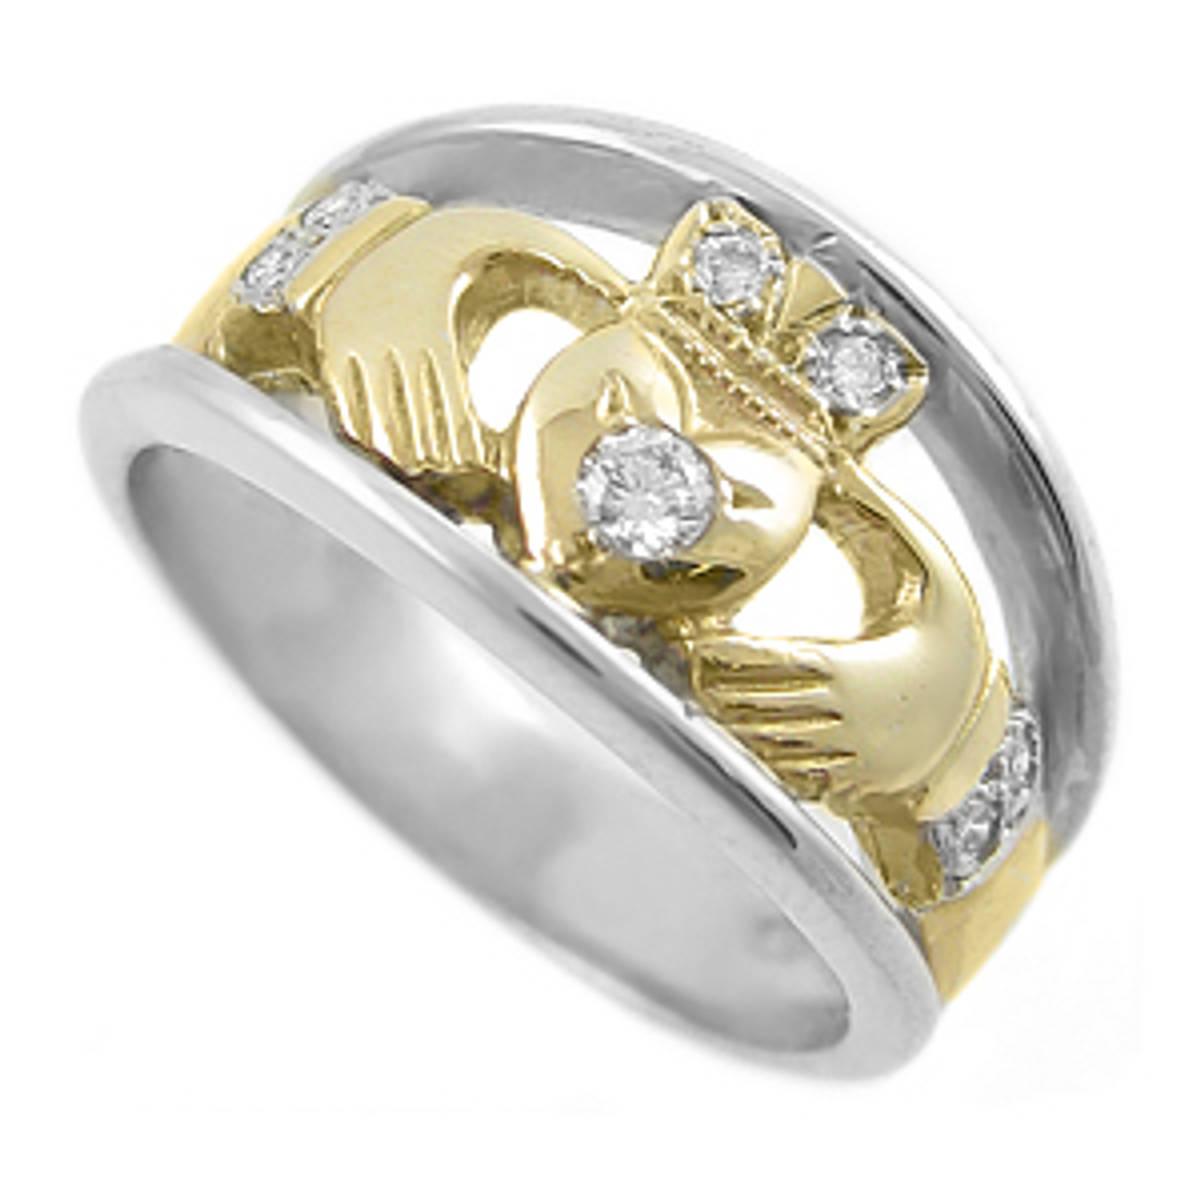 Irish made14 carat white/yellow gold 0.11cts diamonds claddagh engagement ring